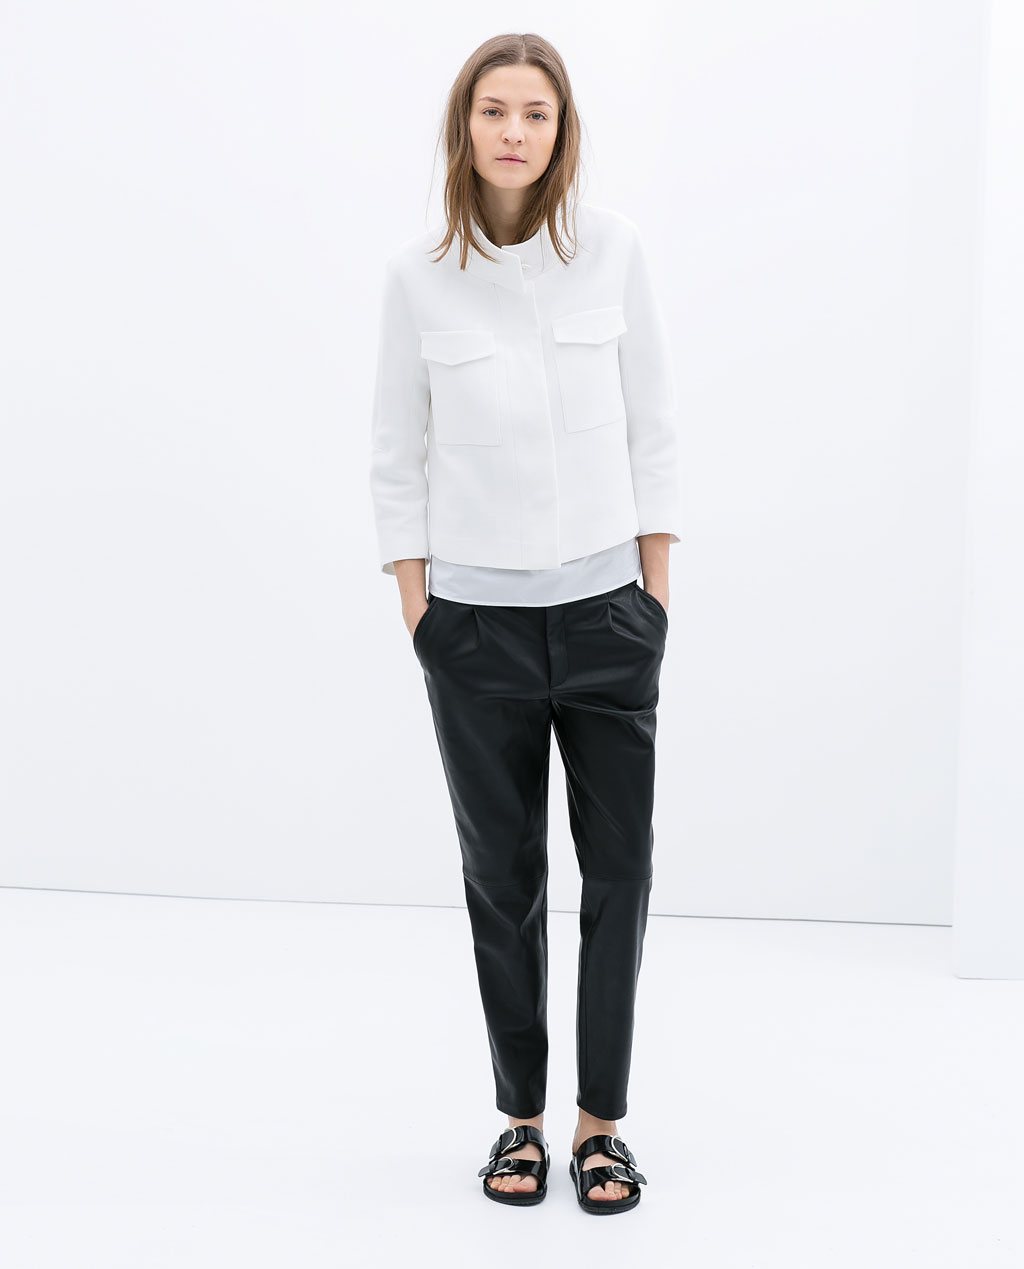 Zara-Look-3